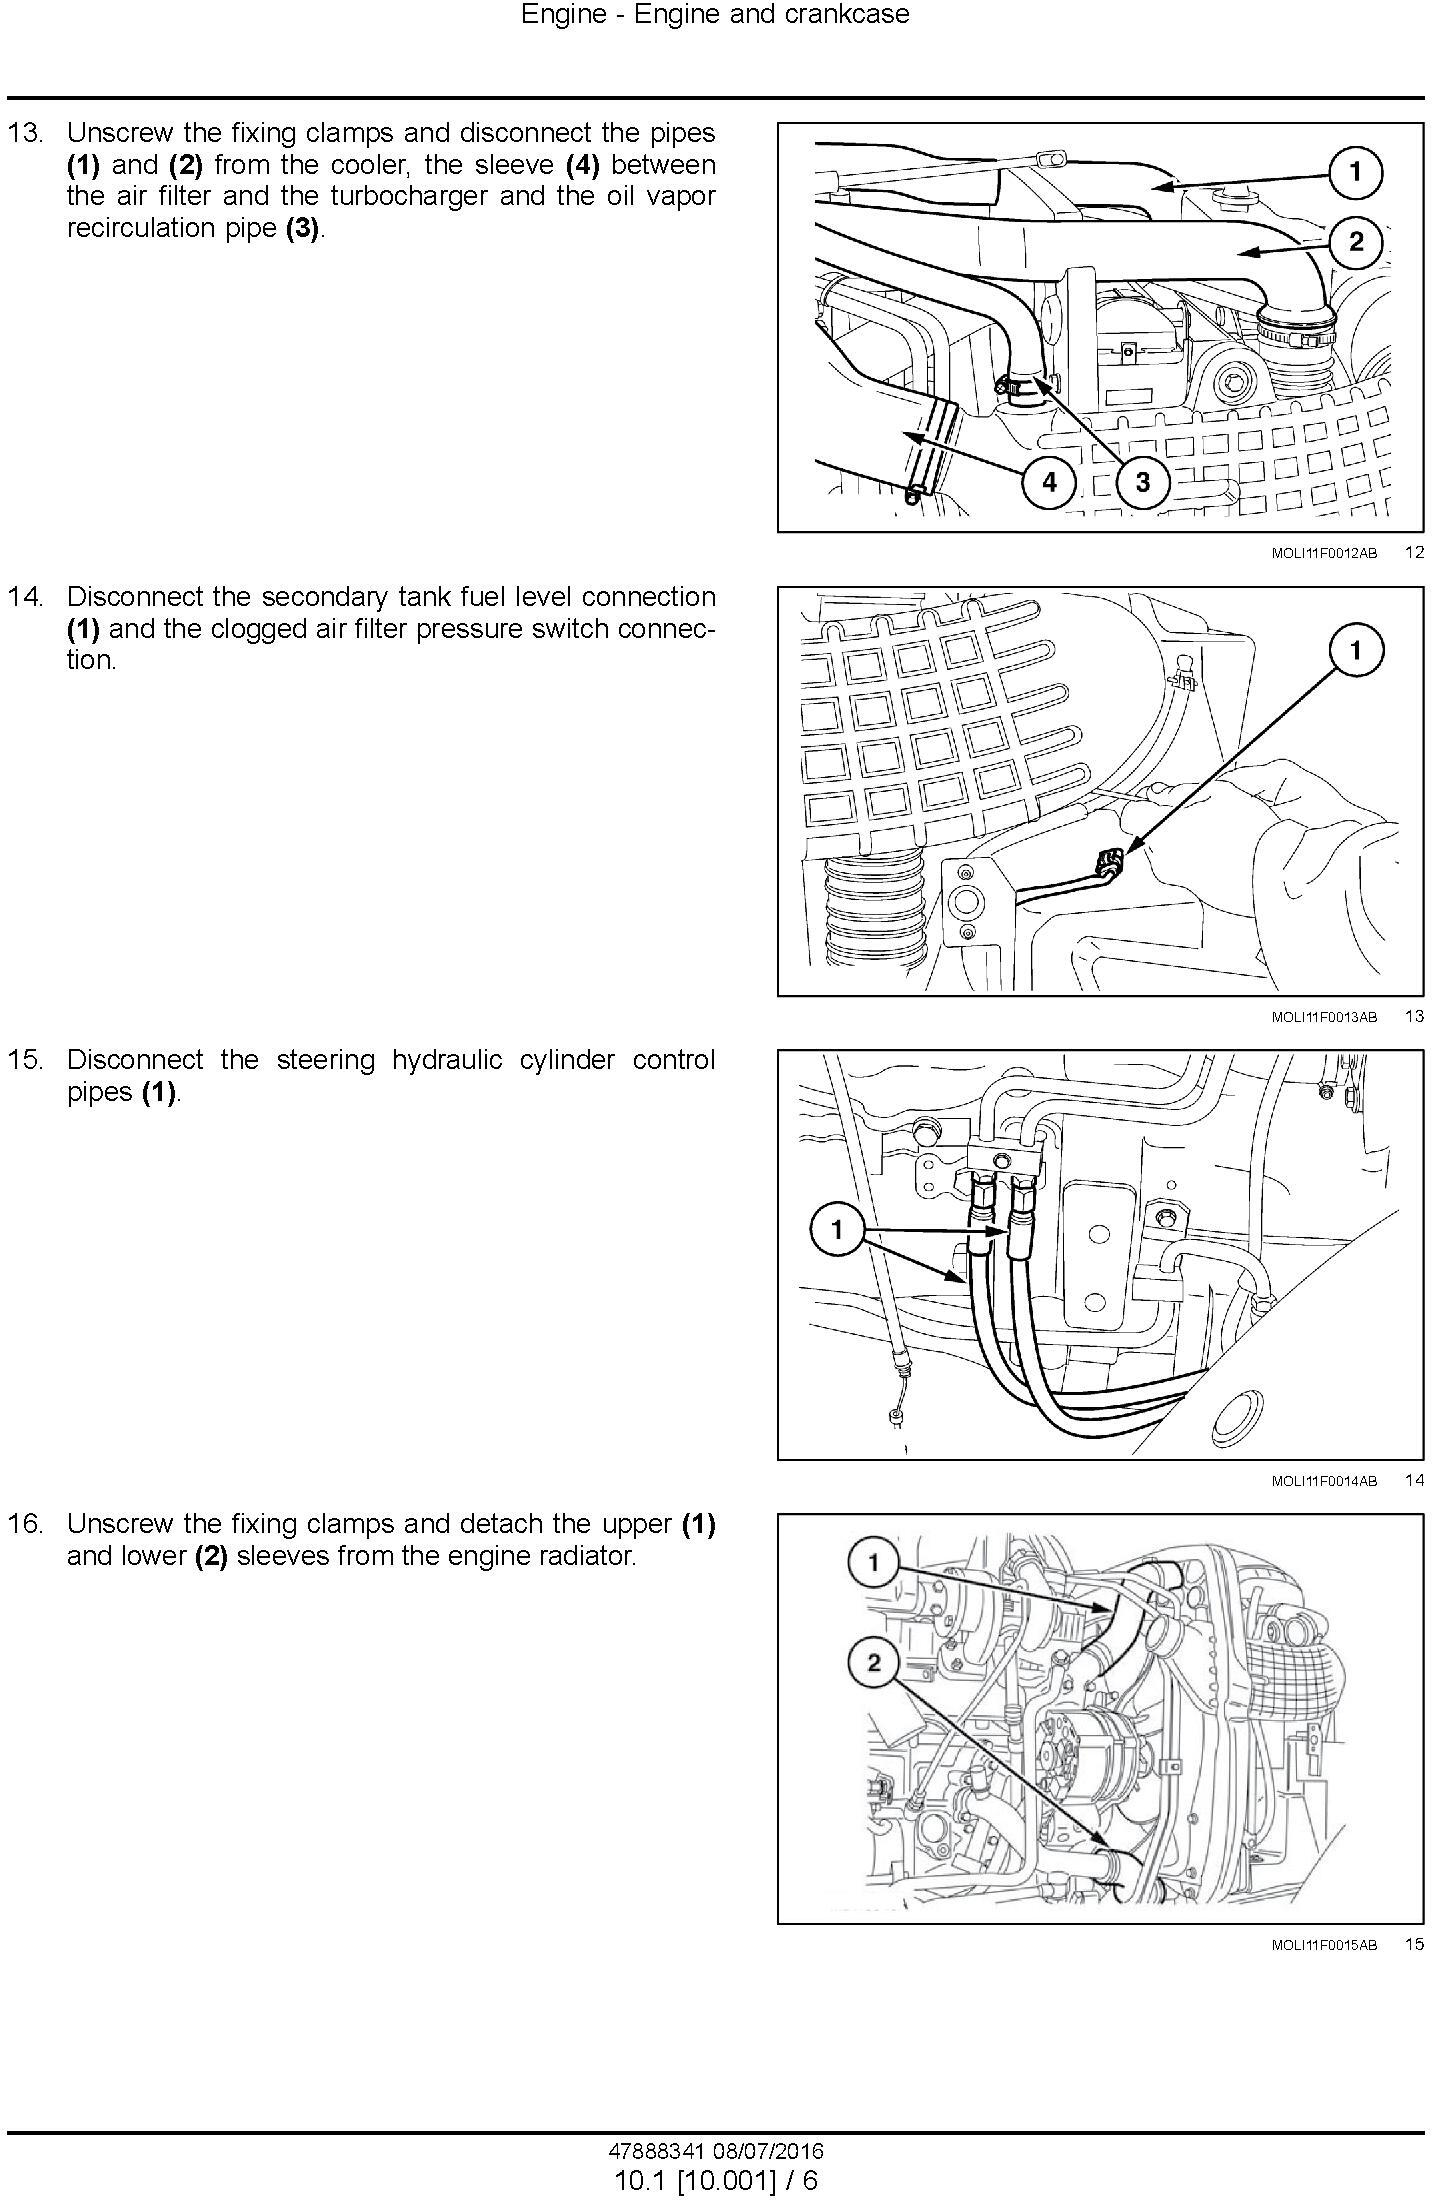 New Holland T4030F, T4040F, T4050F, T4060F Tier 3 Tractor Complete Service Manual (North America) - 1